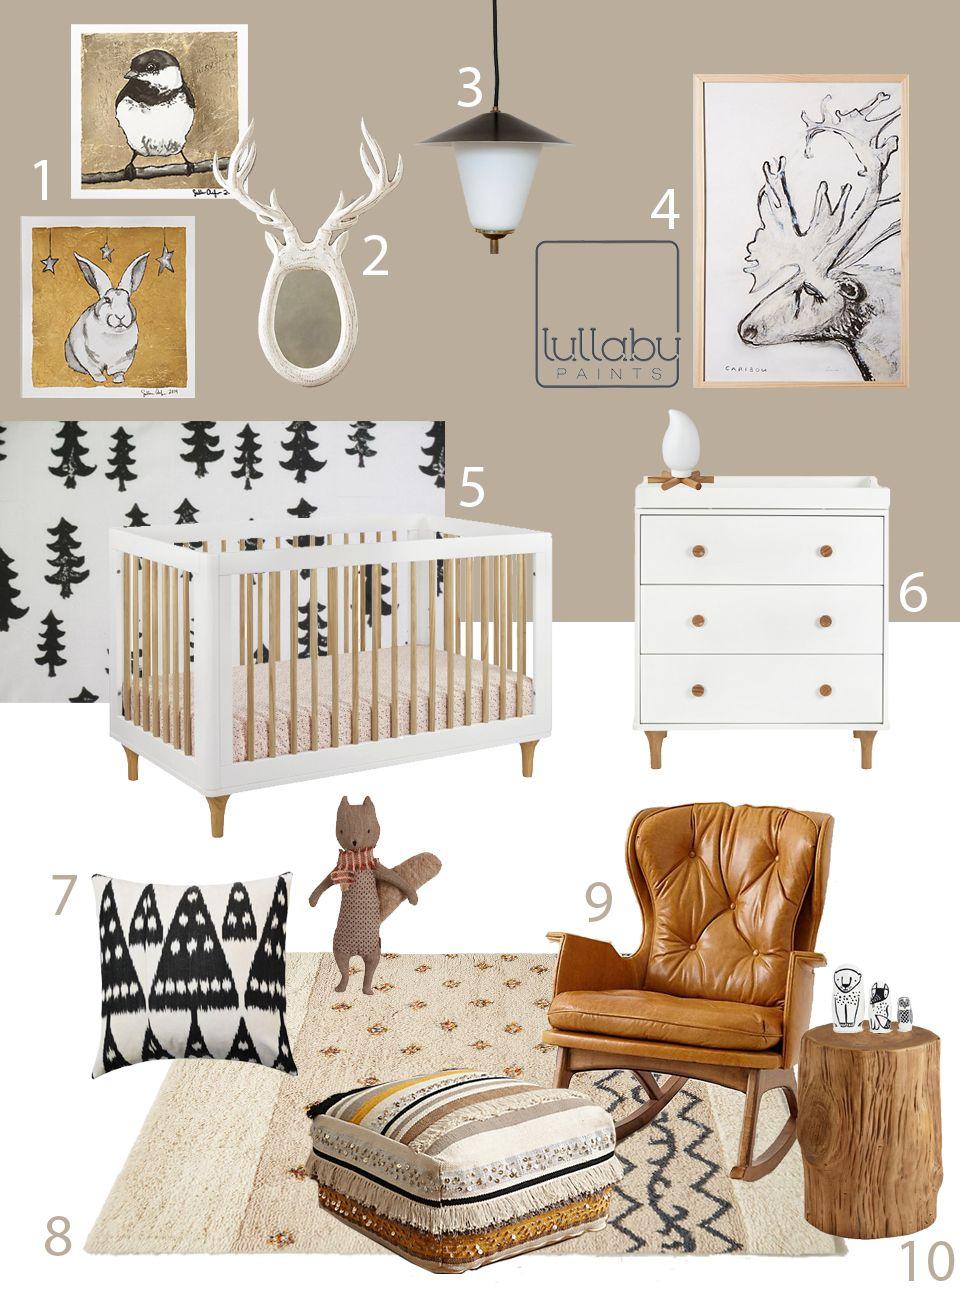 Modern Baby Boy Room: My Modern Nursery 91Winter Woodland Lullaby Paints * I